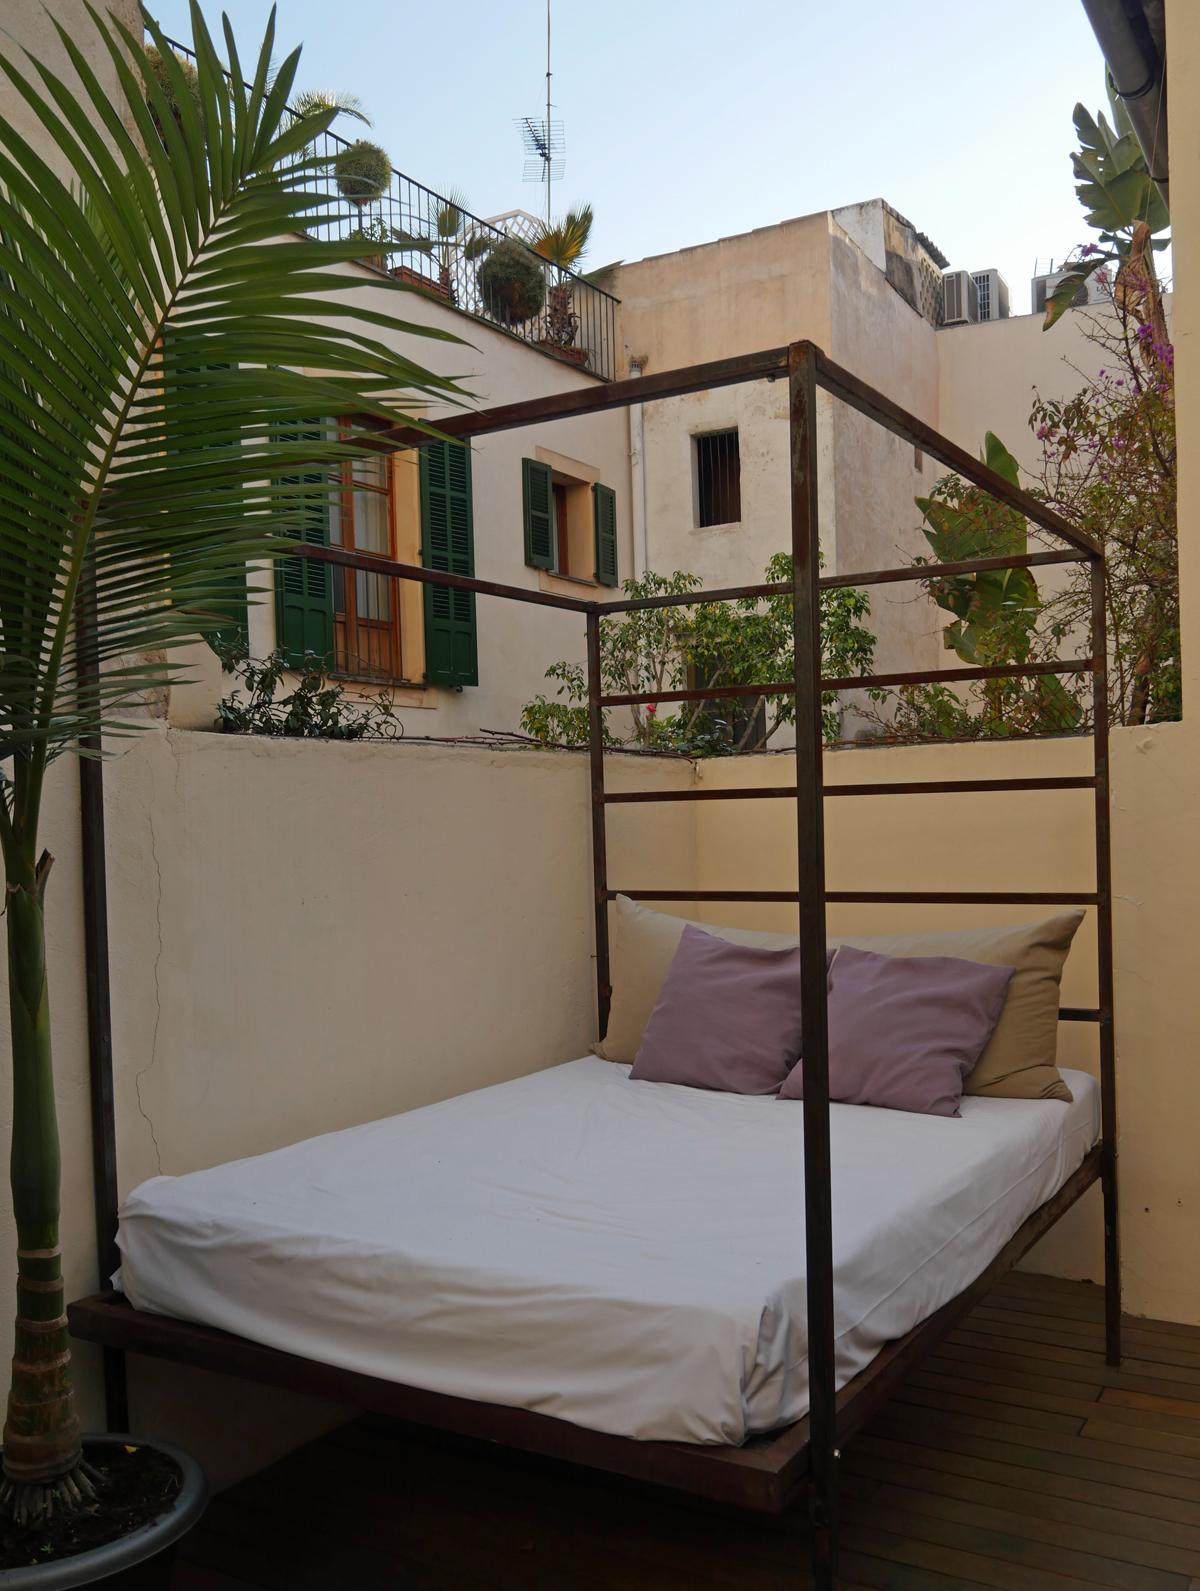 Daybed Hotel Architect Brondo Private Terrace